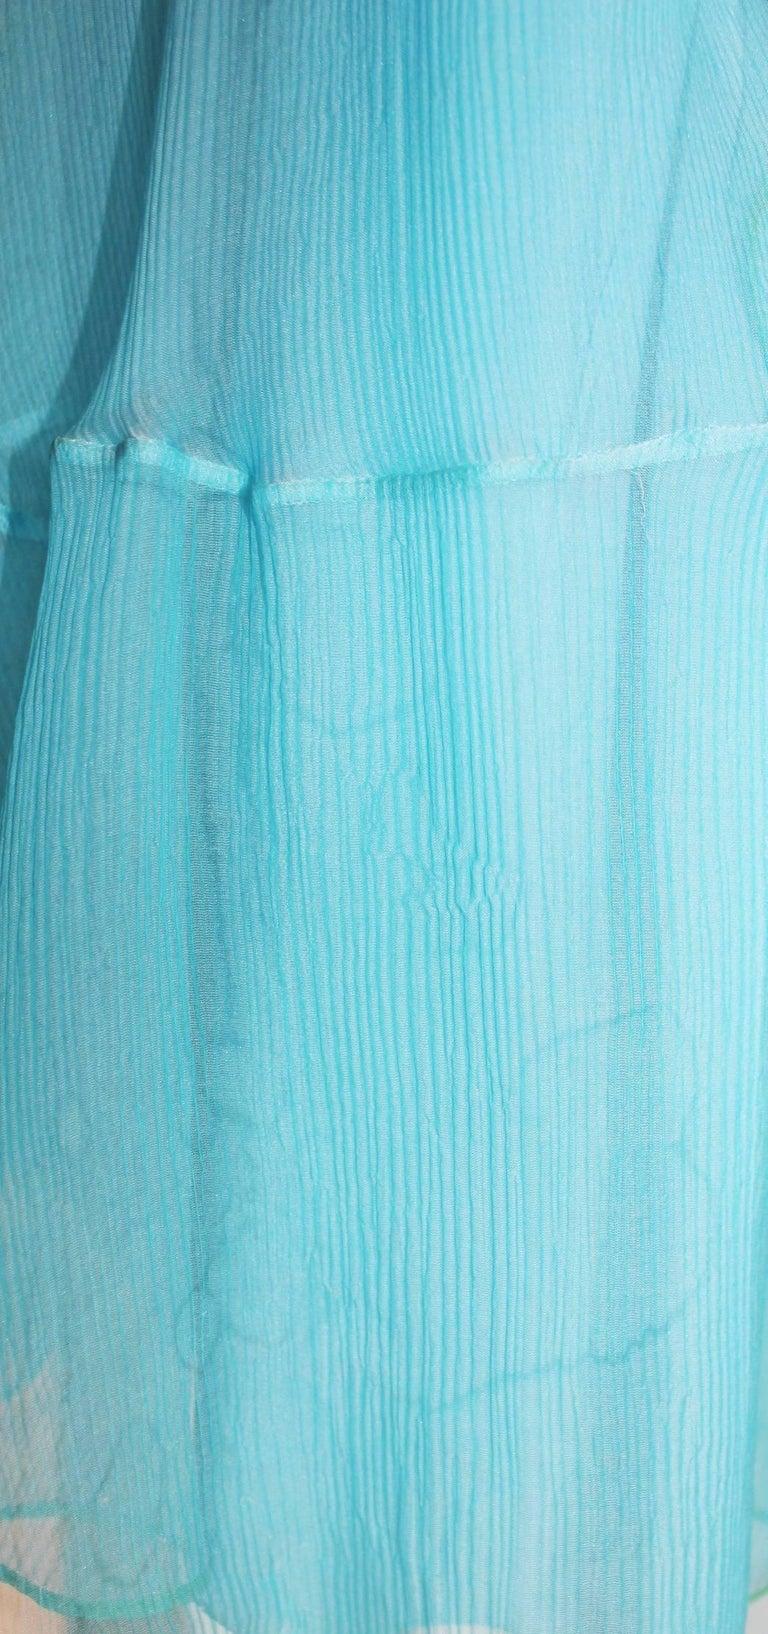 Beautiful Christian Dior by John Galliano Seafoam Silk Chiffon Dress  6